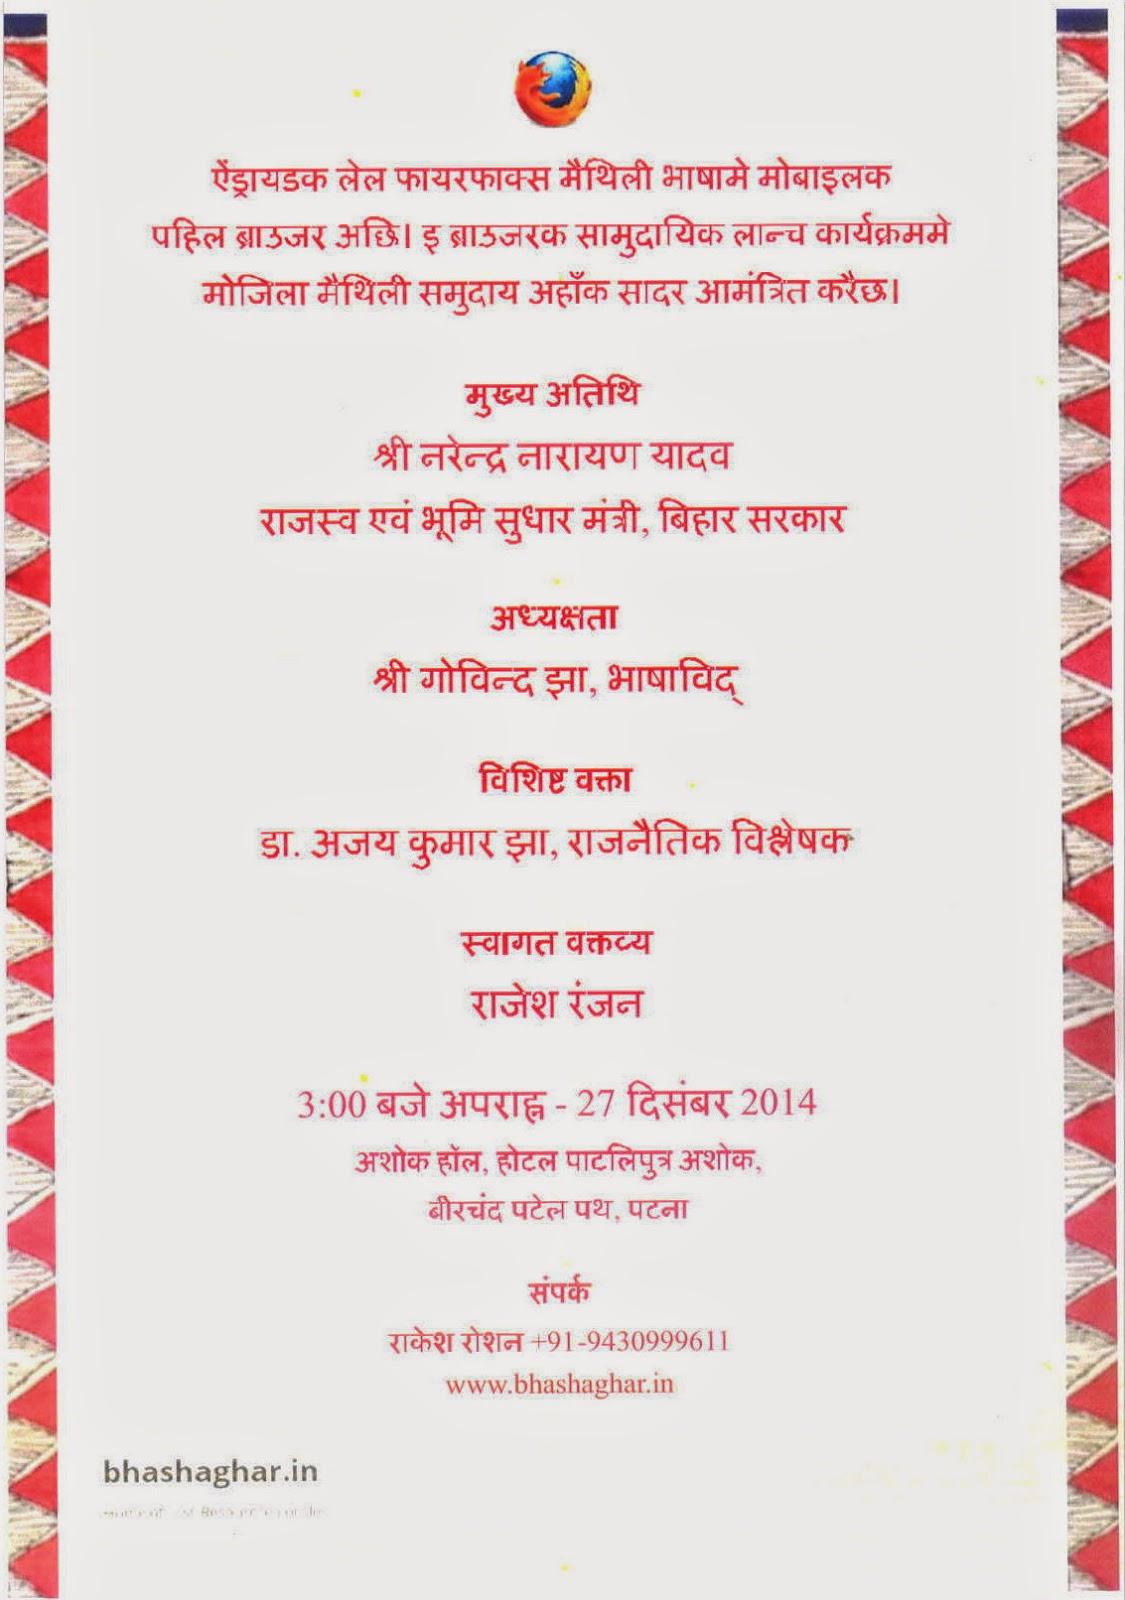 Jagran invitation card wordings in hindi all the best invitation wedding es for invitation cards in hindi ideas hindu stopboris Images